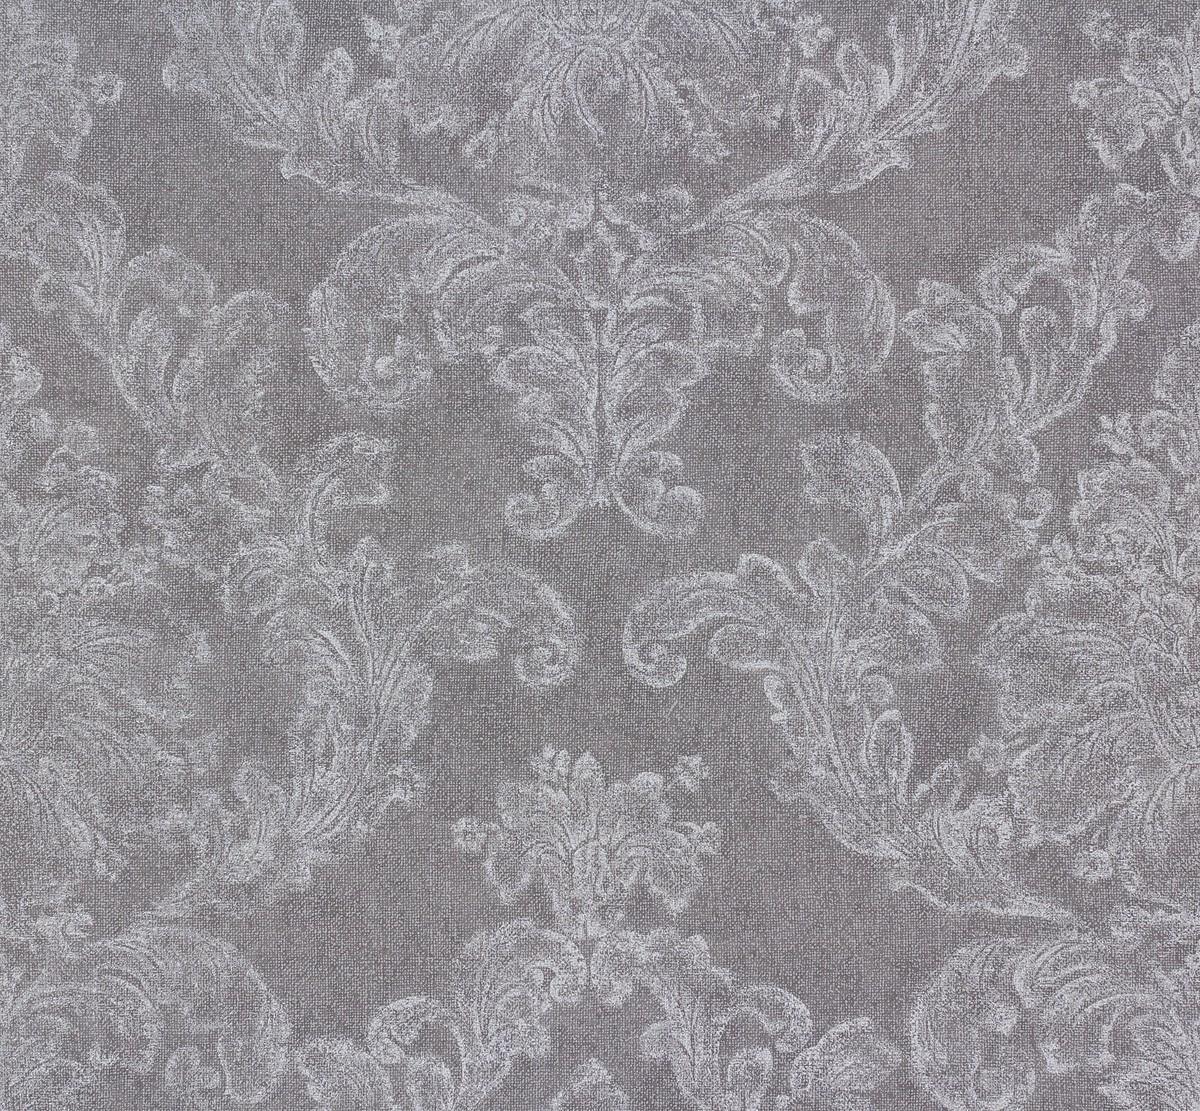 tapete elegance as creation ornamente grau wei 30518 4. Black Bedroom Furniture Sets. Home Design Ideas